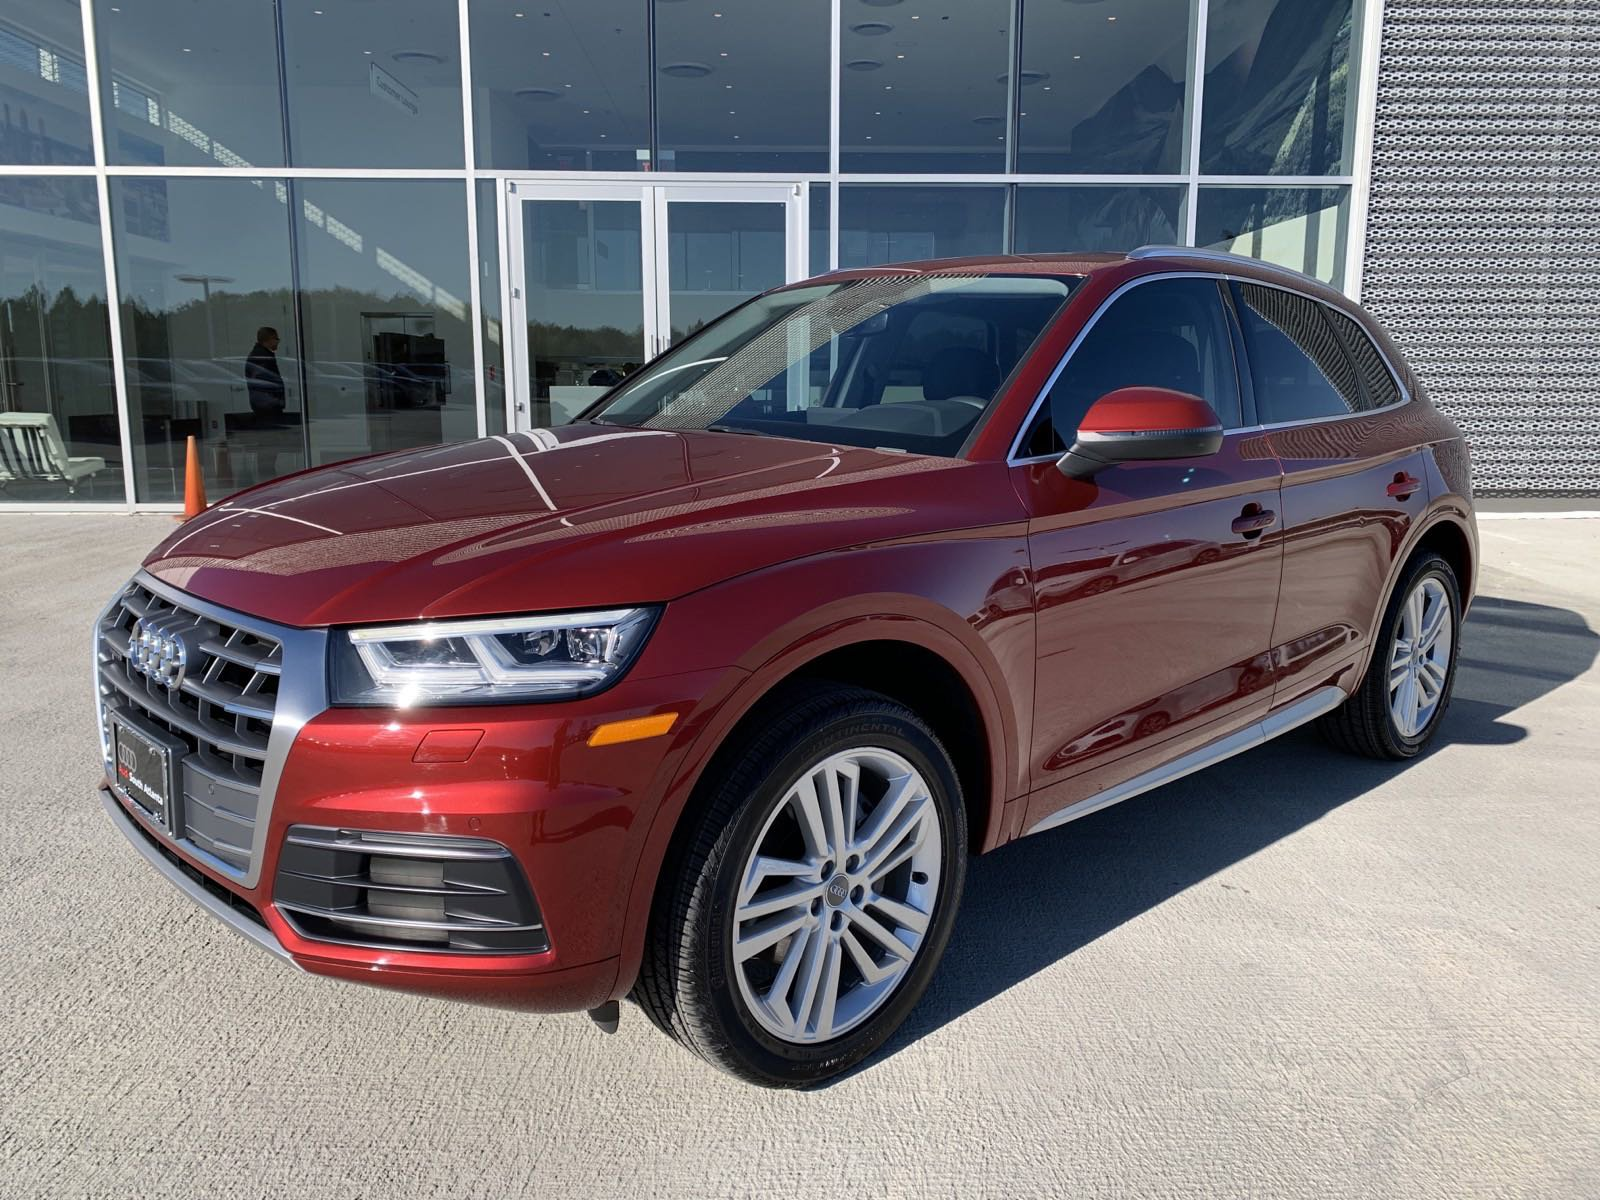 Certified Pre-Owned 2018 Audi Q5 Tech Premium Plus